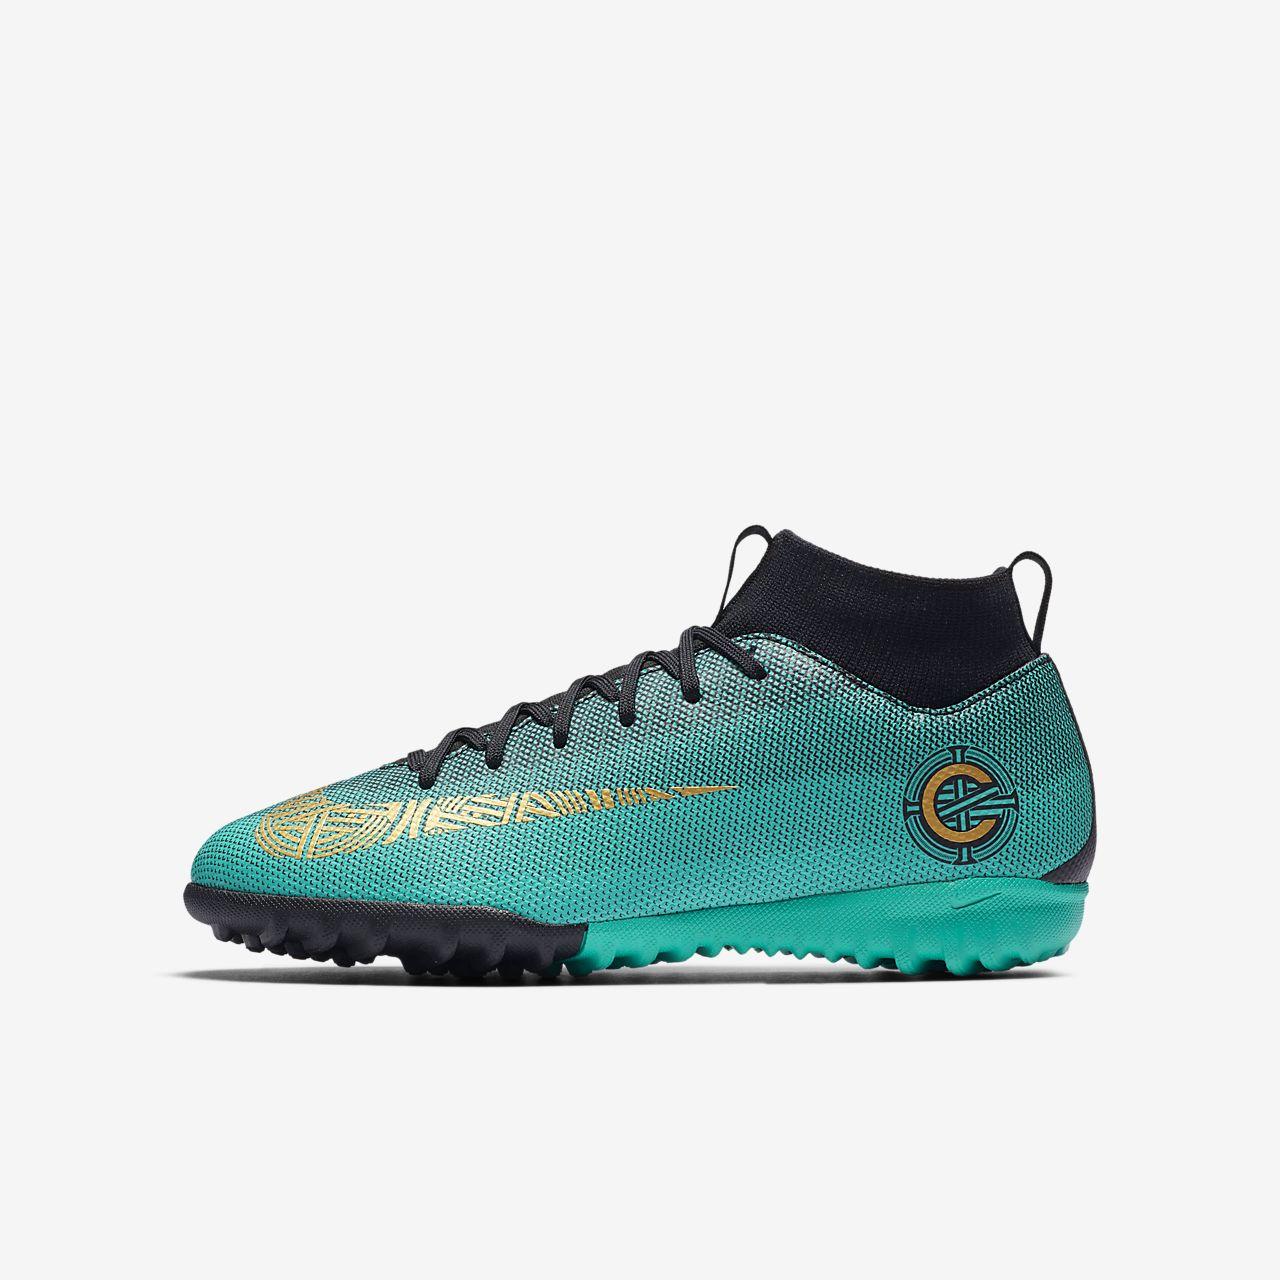 Chaussure de football pour surface synthétique Nike MercurialX